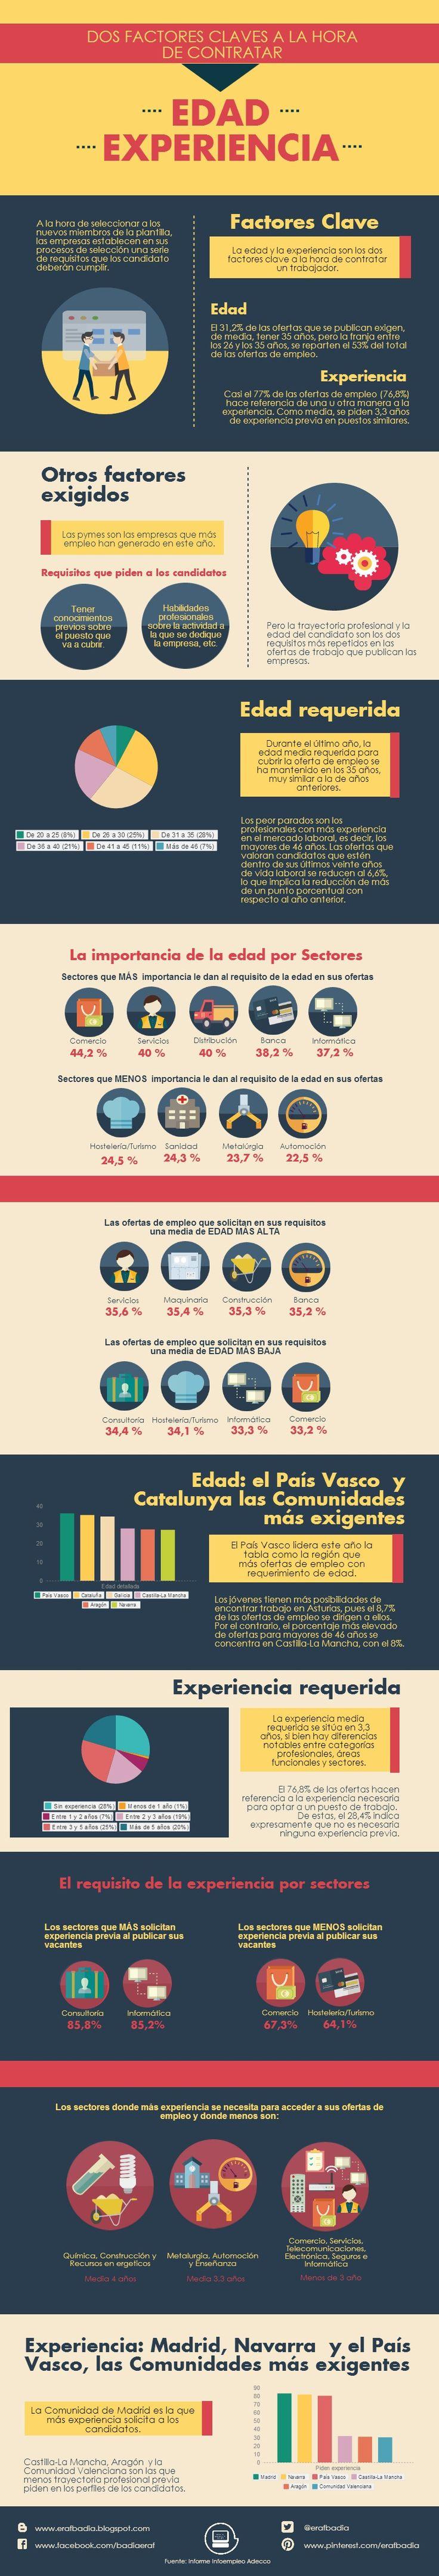 Dos factores claves a la hora de contratar. #infografia #infographic #empleo #rrhh